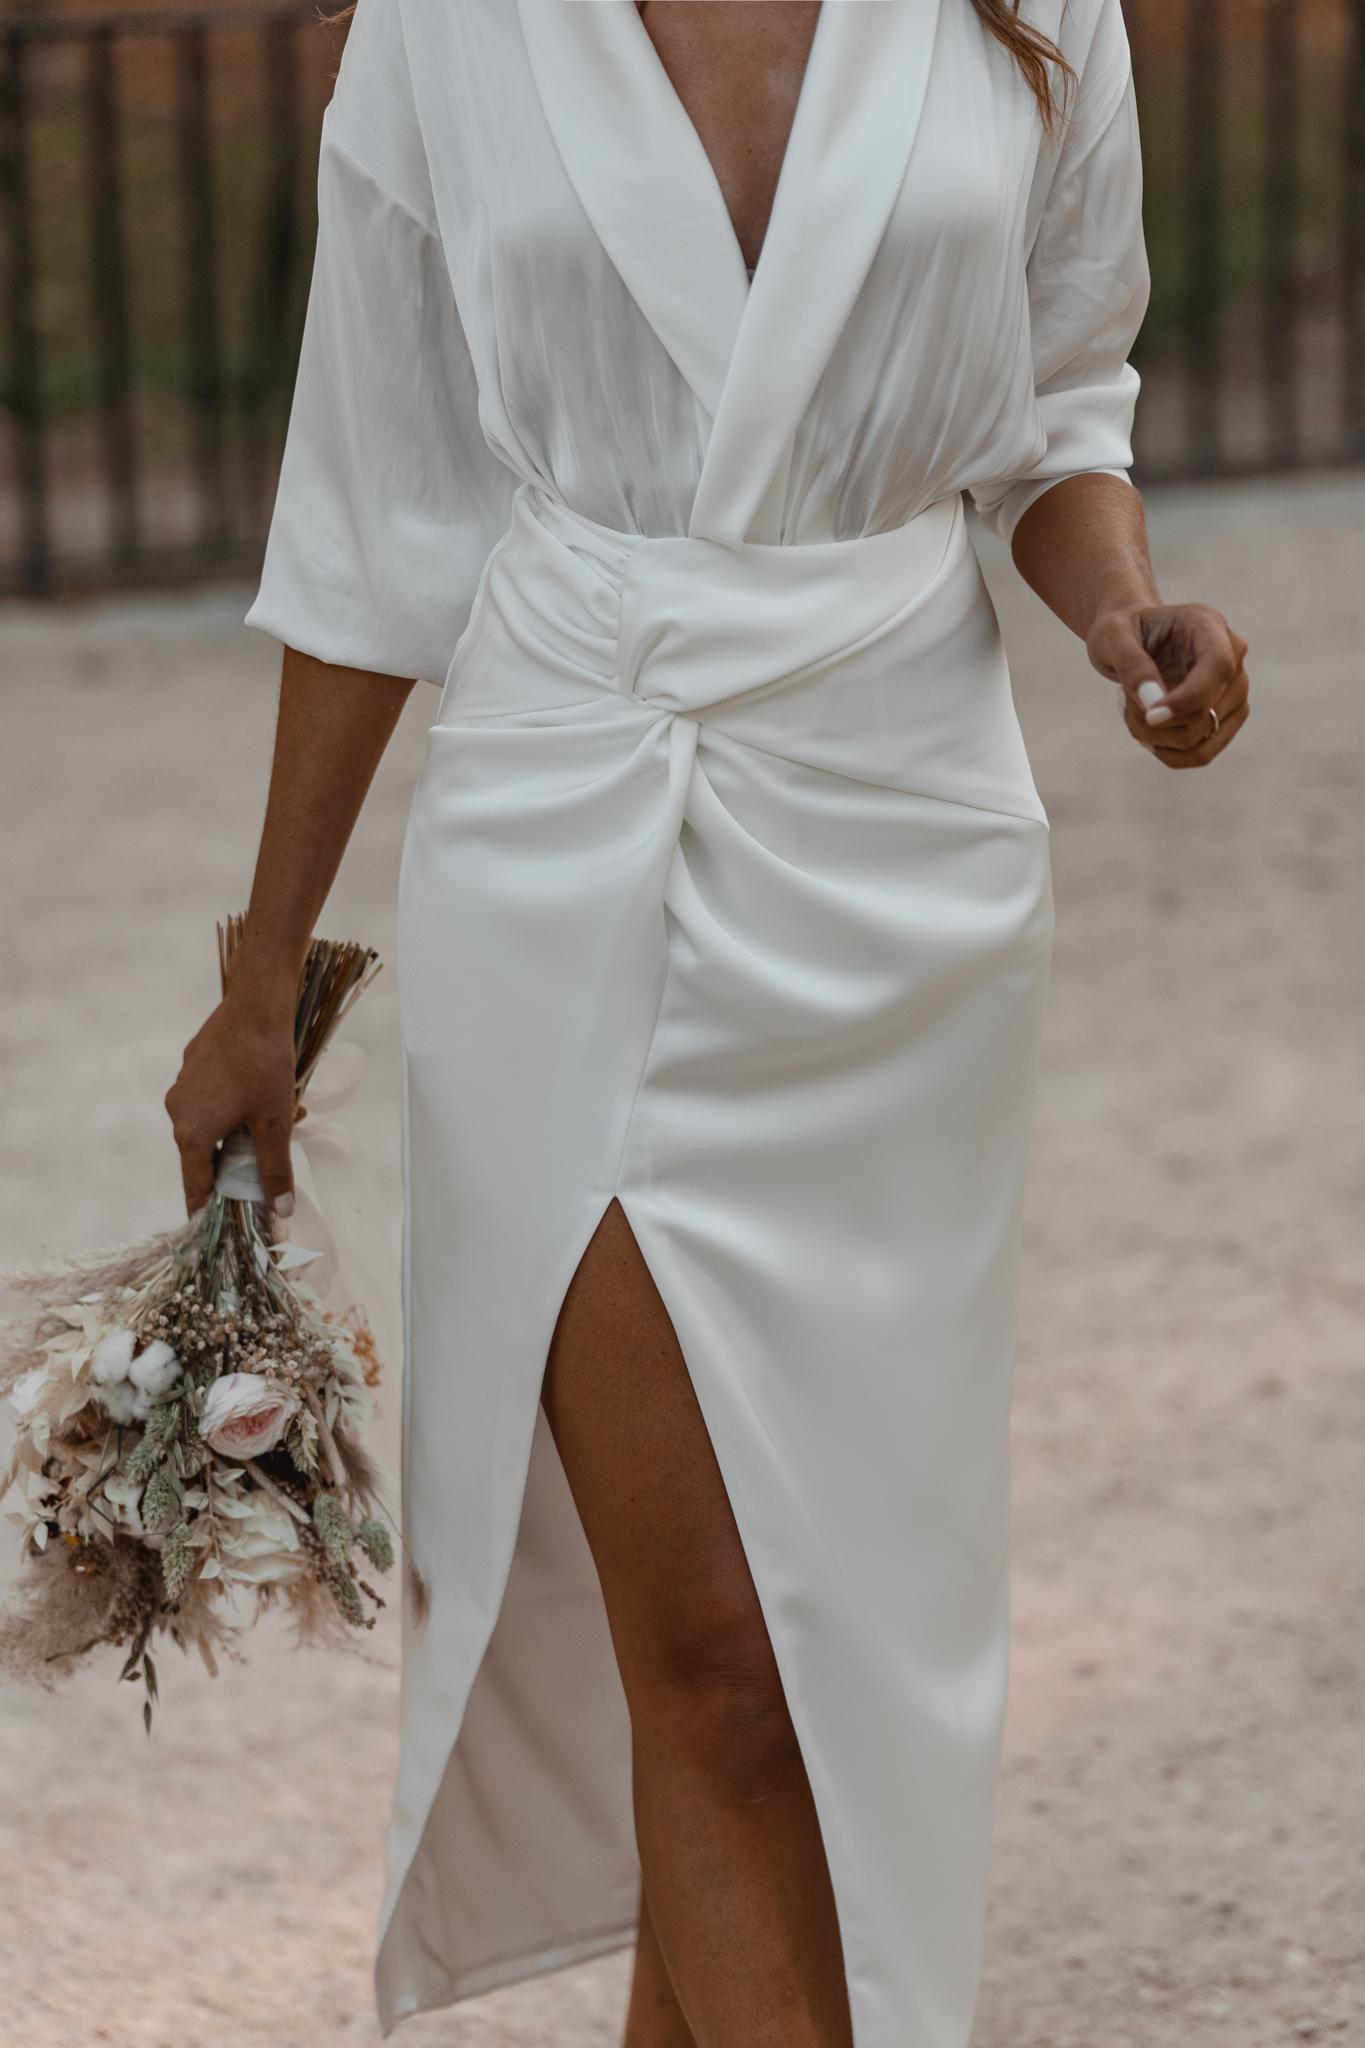 falda blanca novia